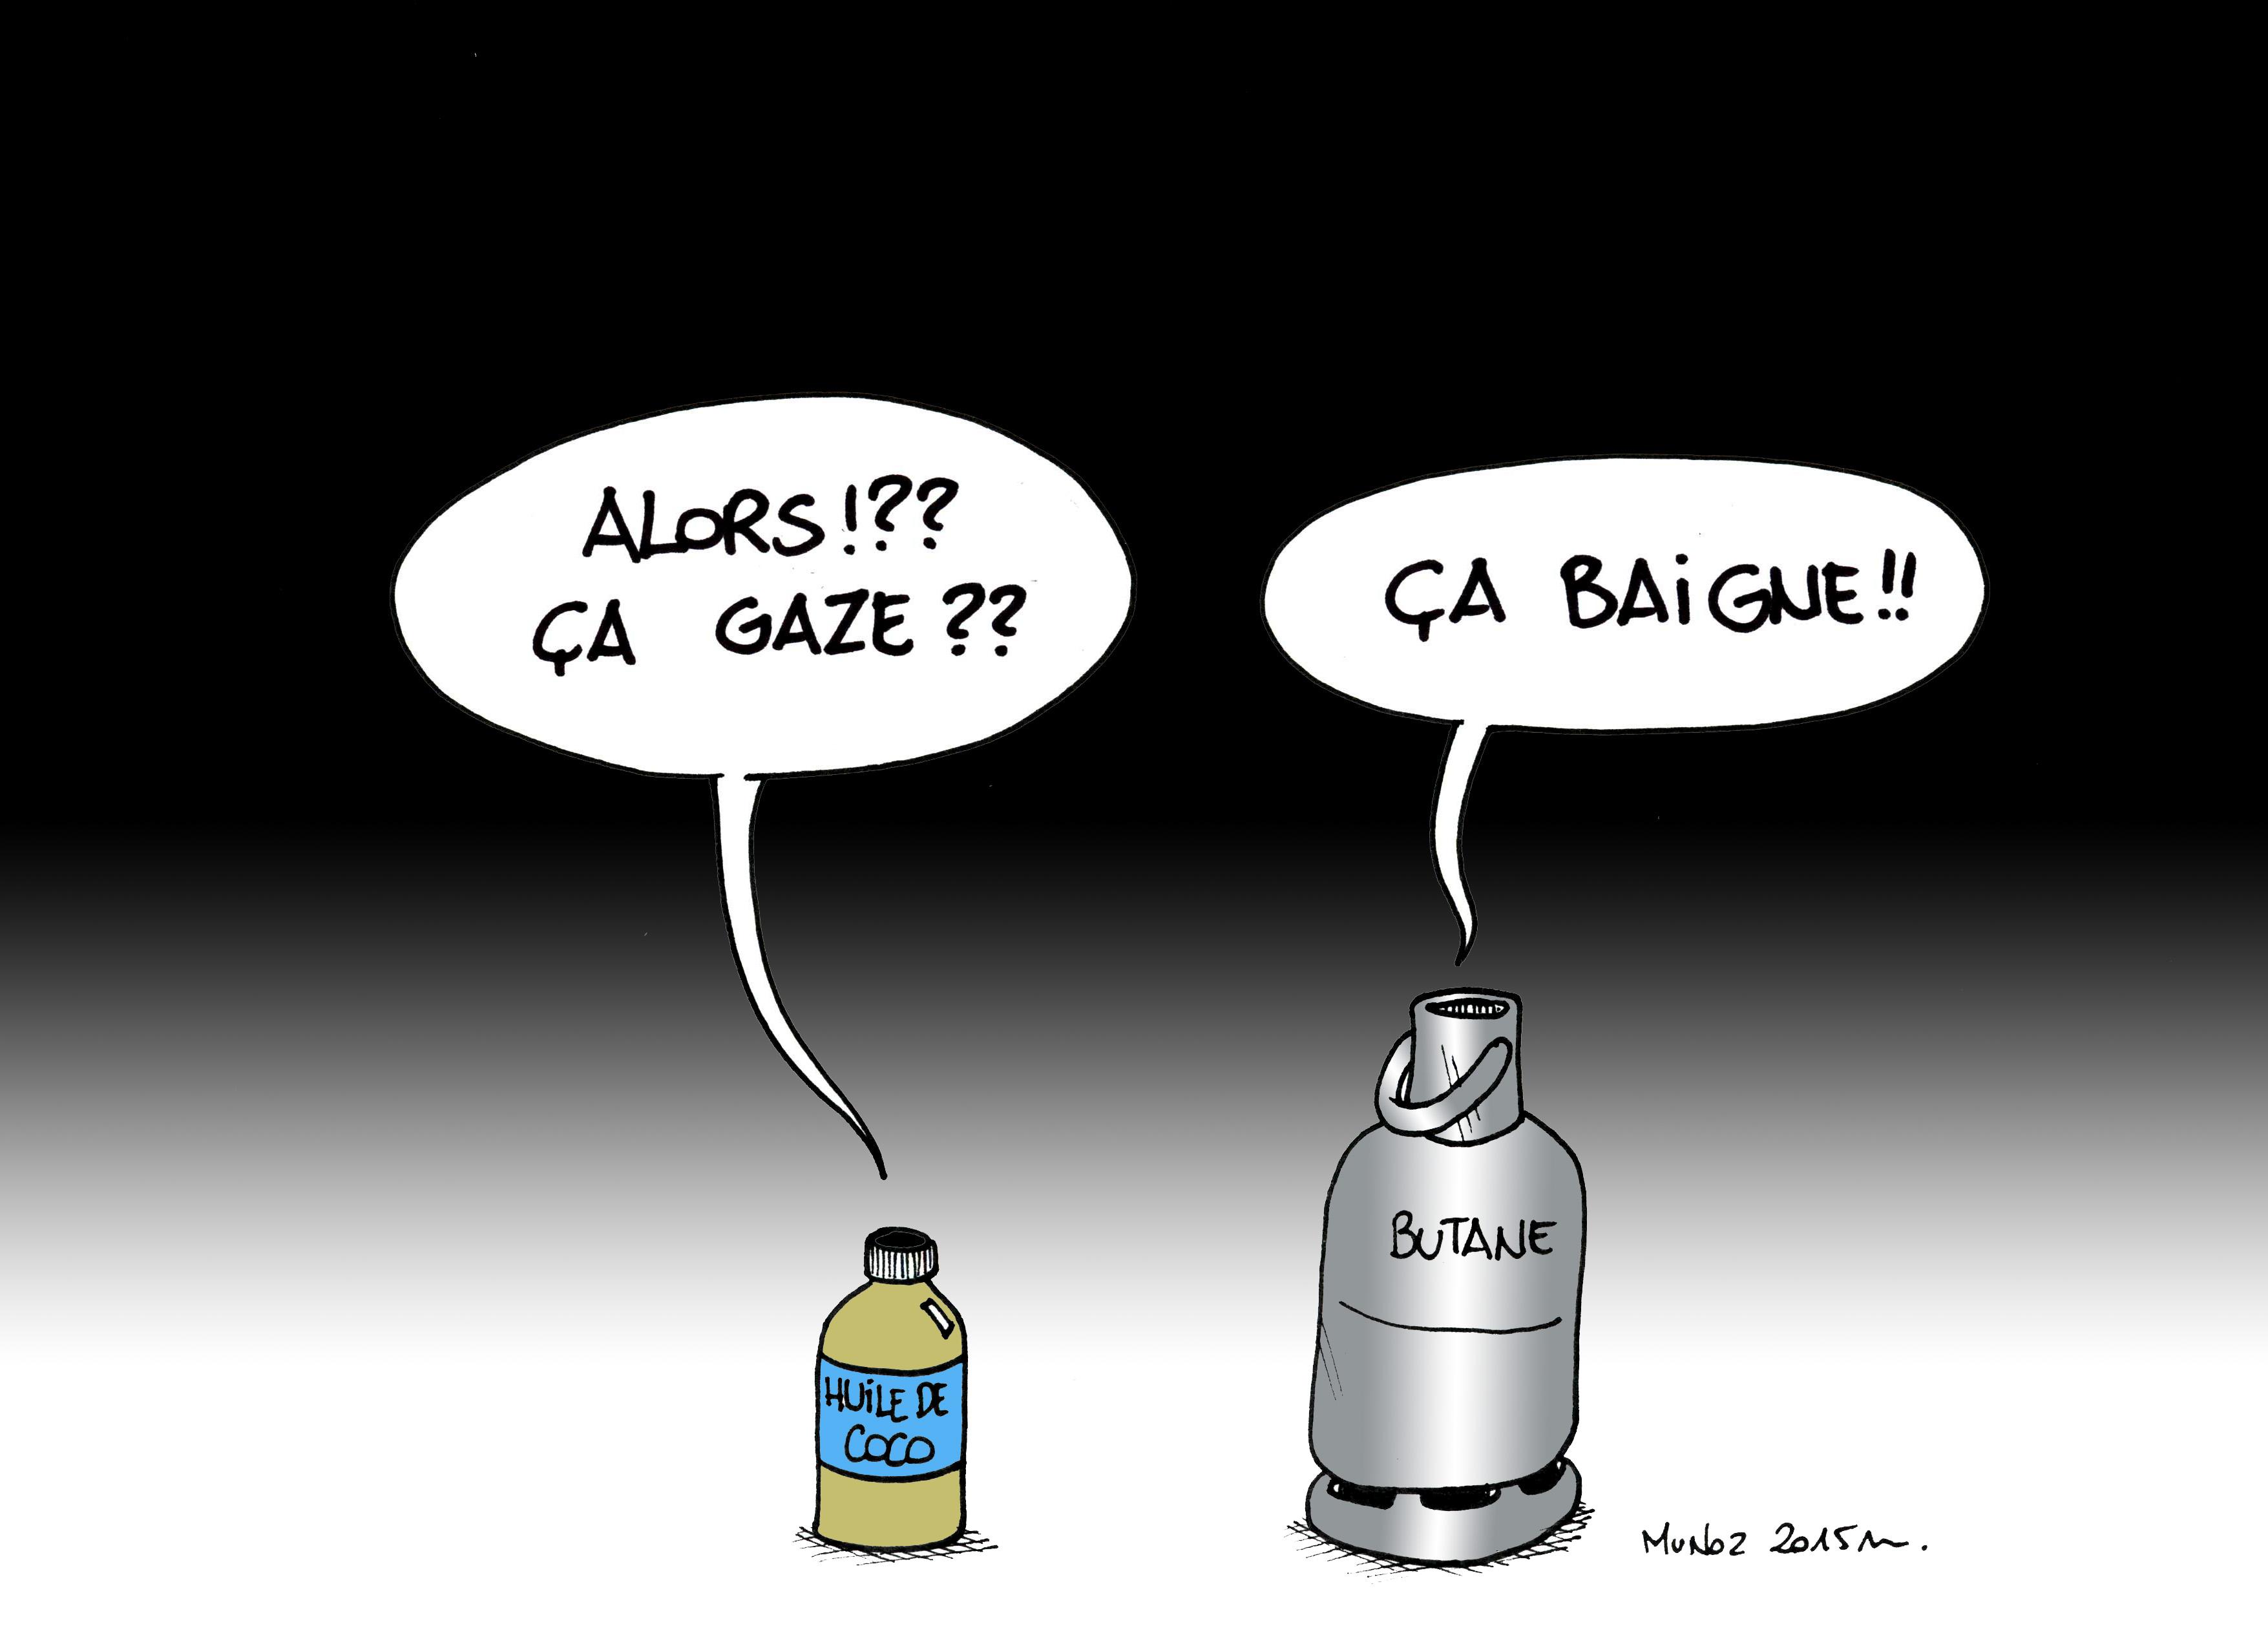 La pénurie de gaz par Munoz